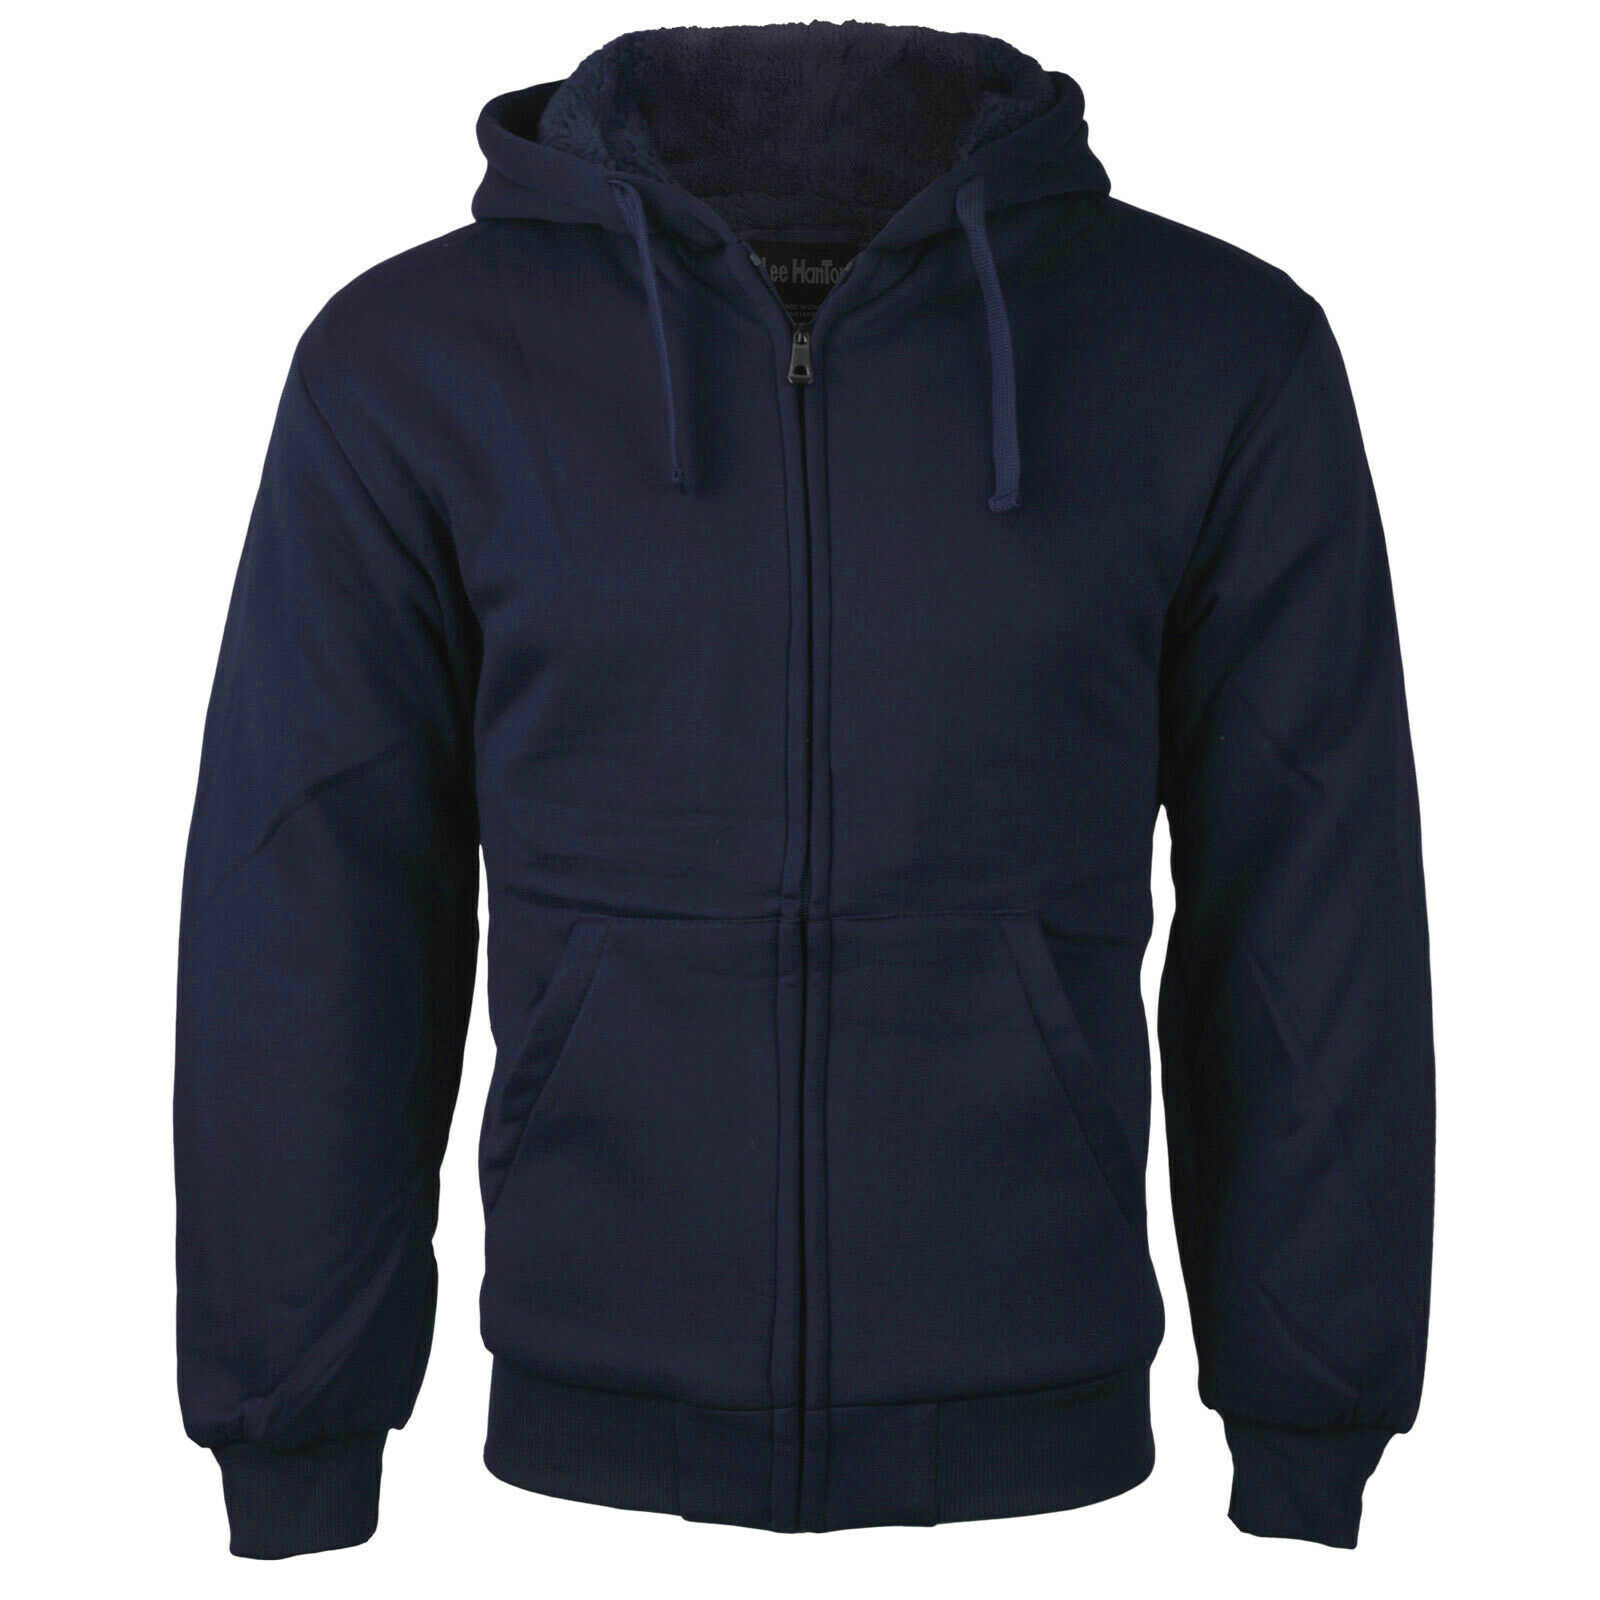 Men's Athletic Soft Sherpa Lined Fleece Zip Up Hoodie Navy Sweater Jacket